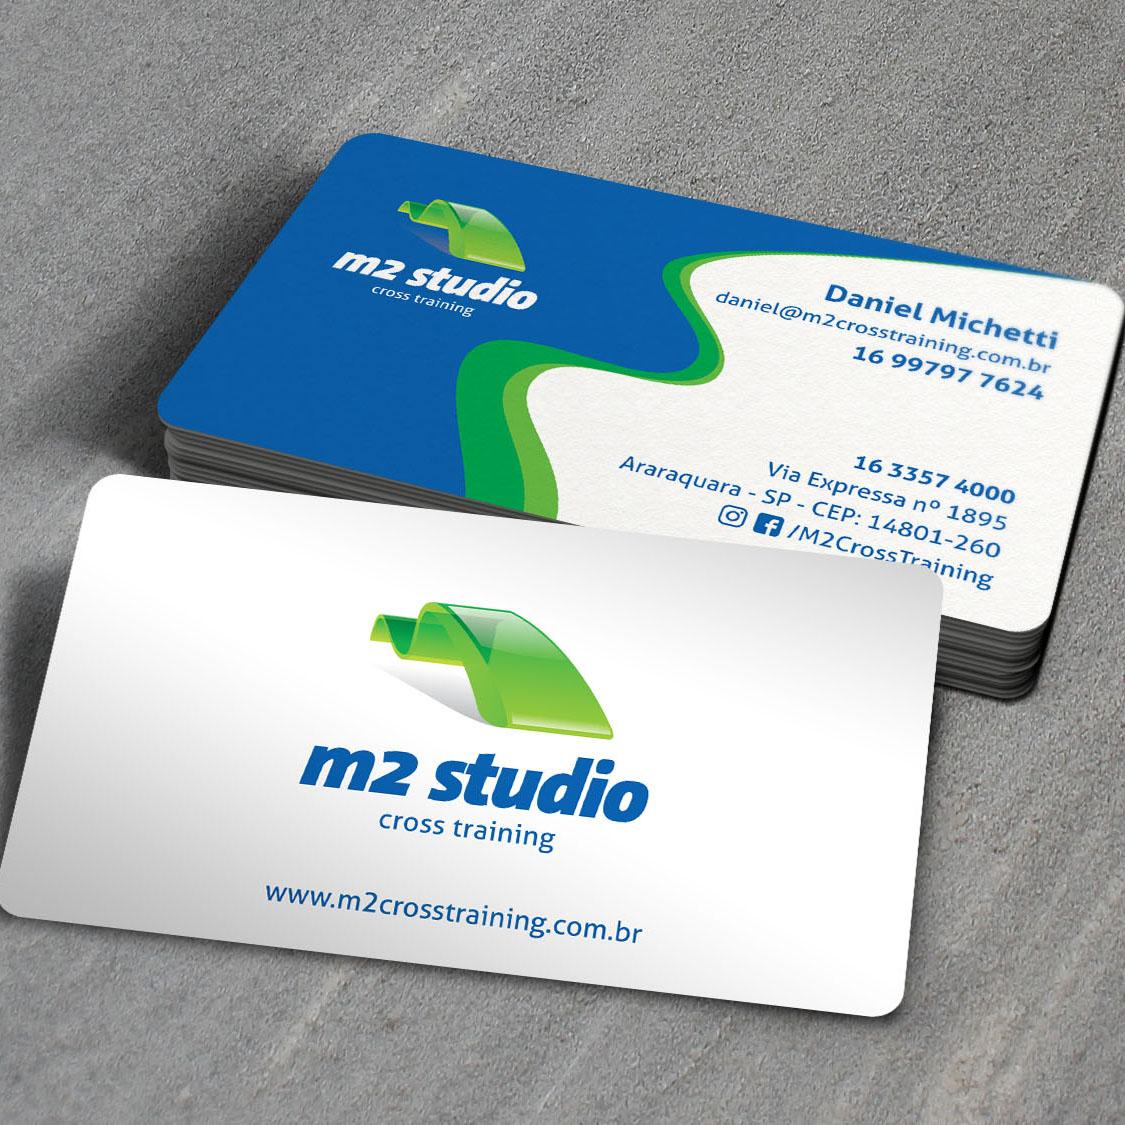 M2 Studio - Cross Training